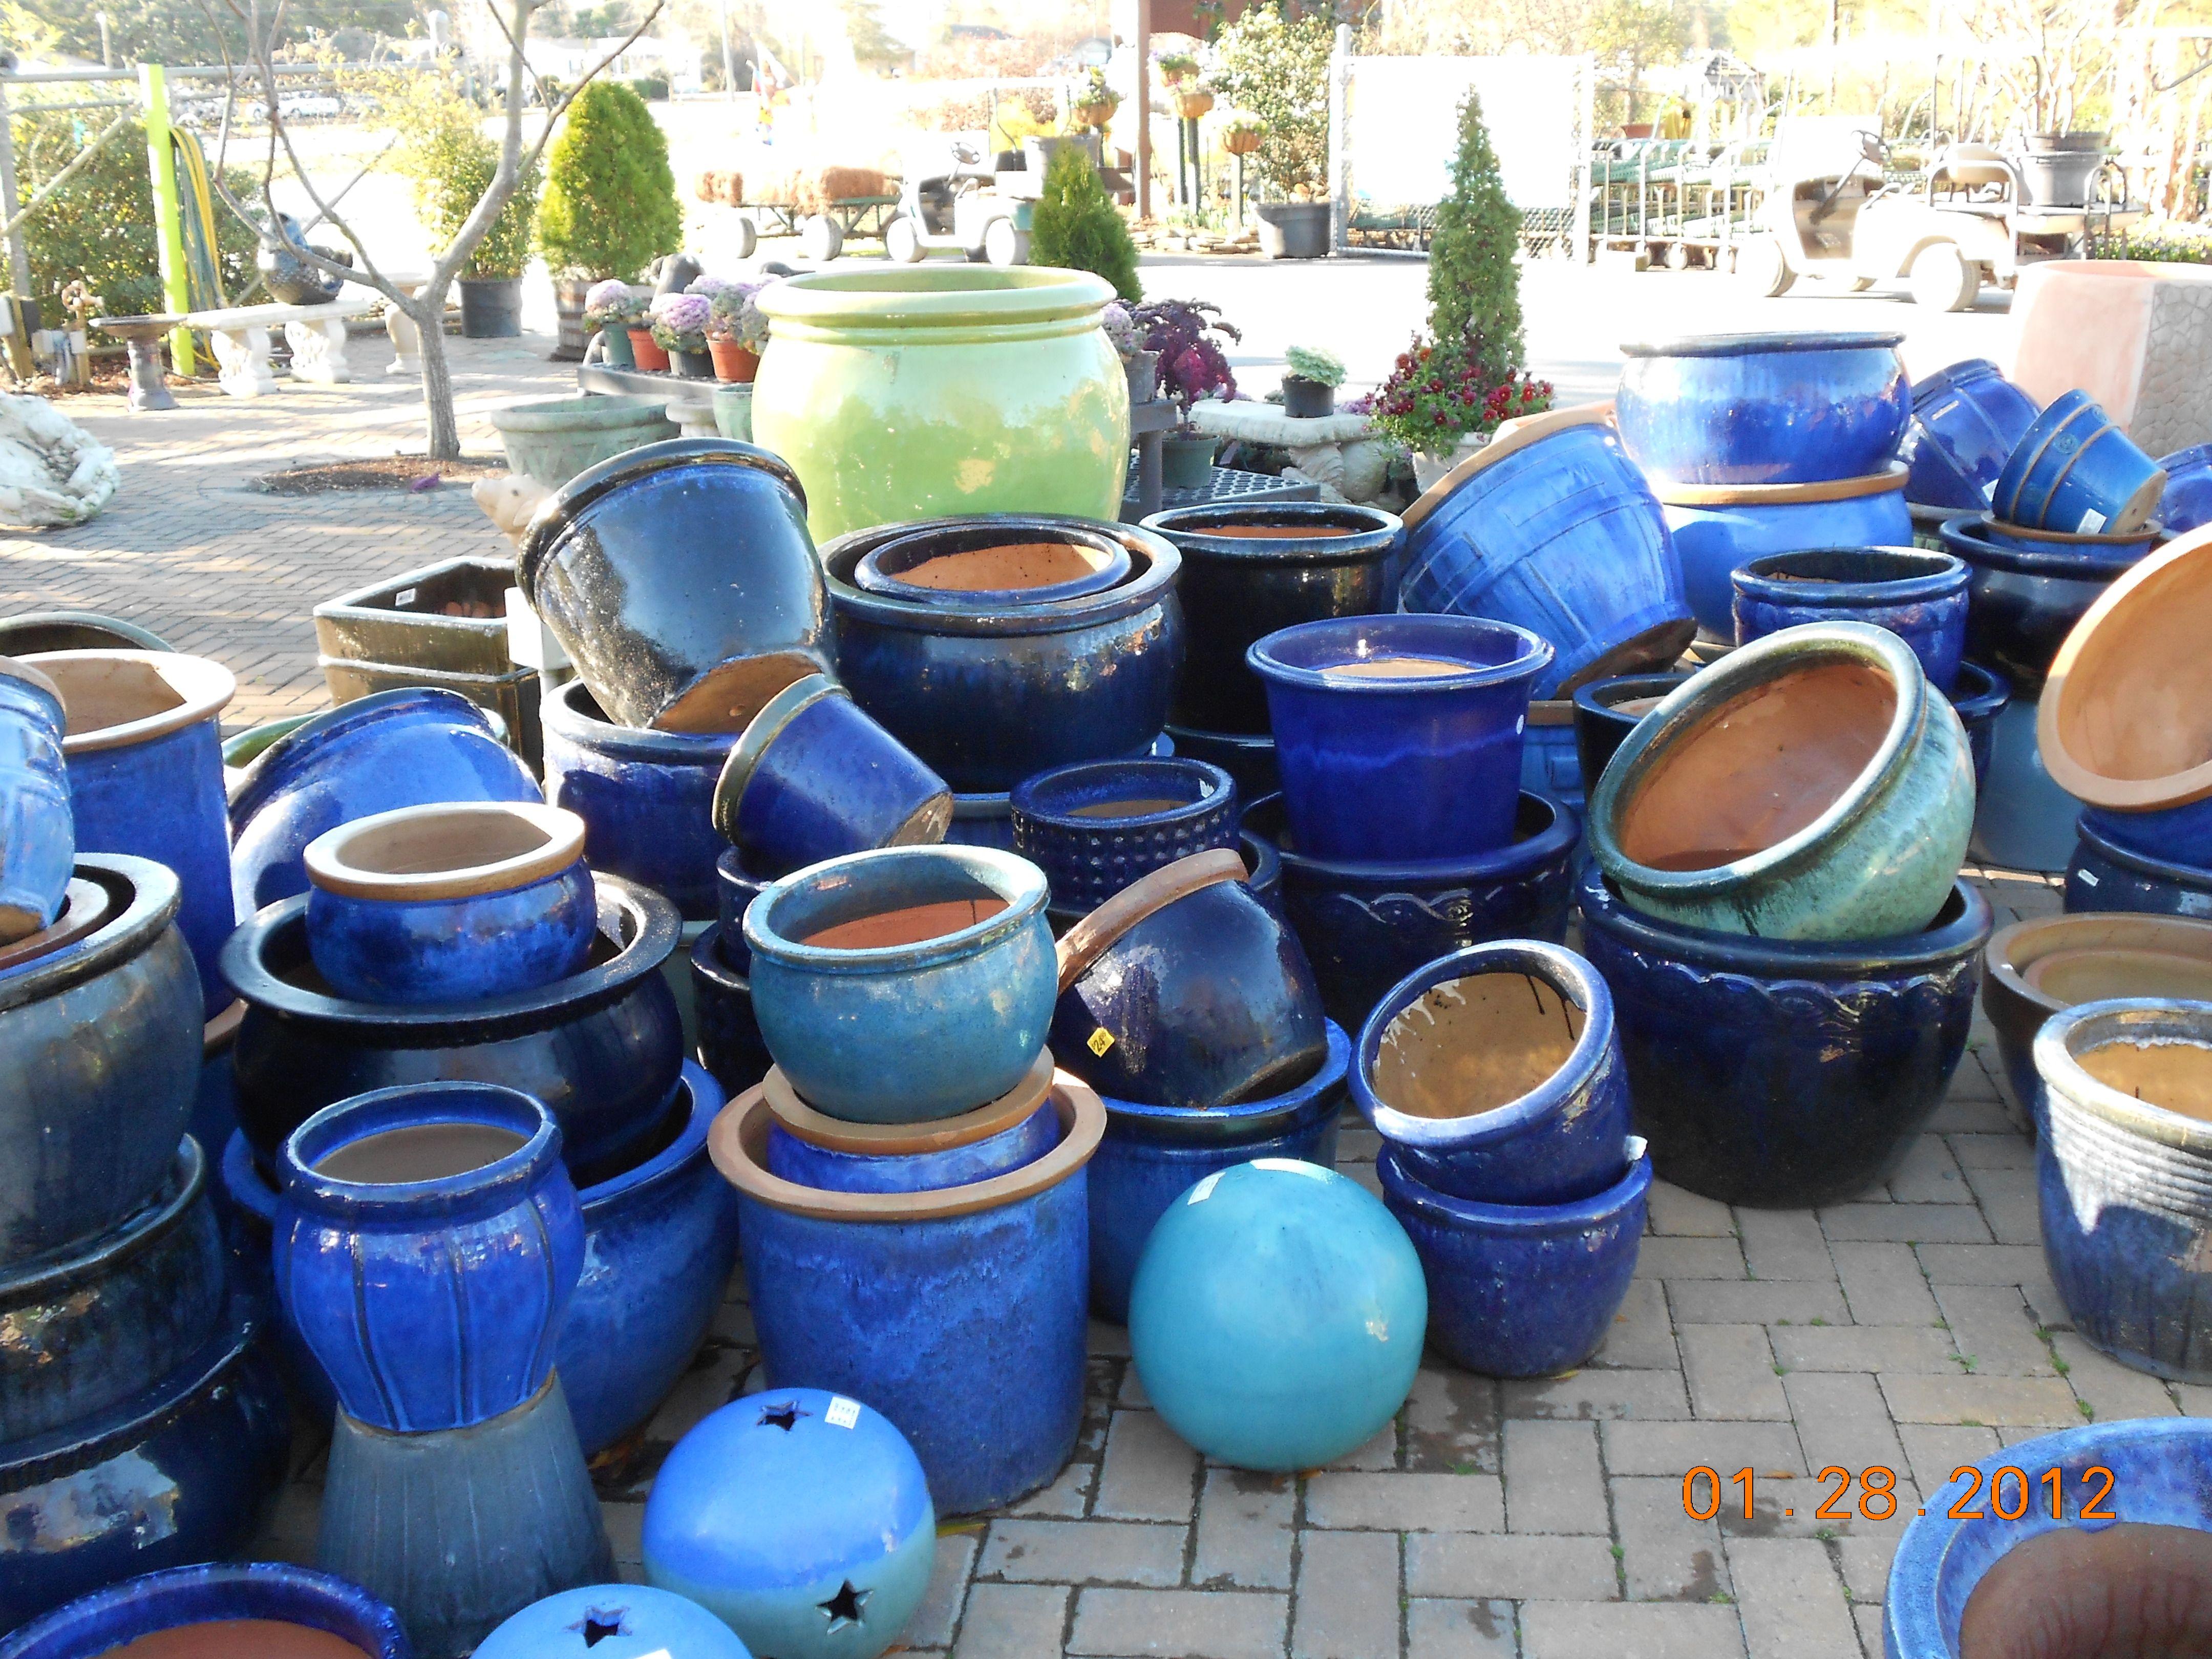 Bird Baths/Fountains/Pottery/Statuary | Pender Pines Garden Center